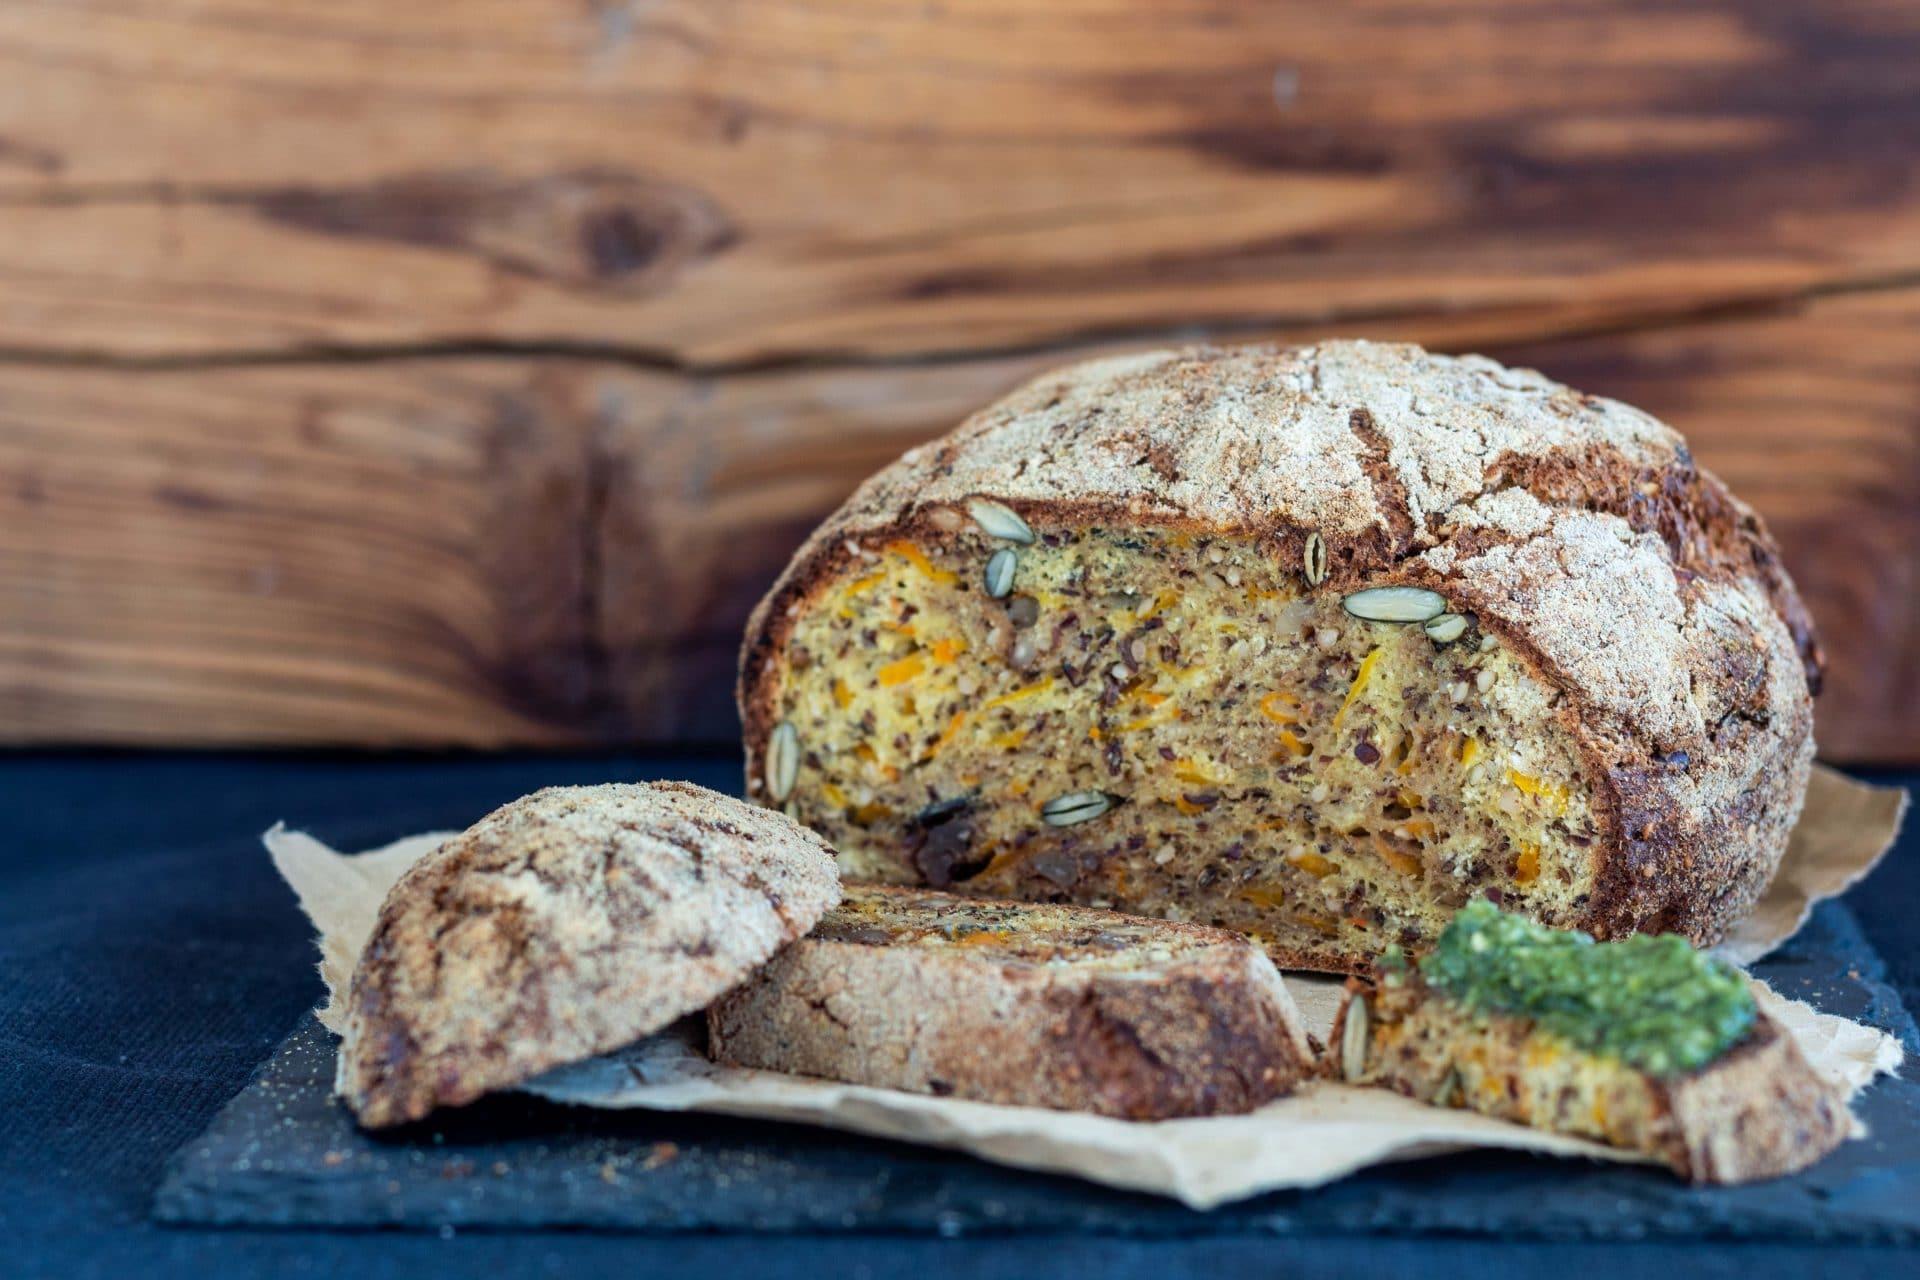 Pikantes low carb Kürbis Brot vom Pizzastein